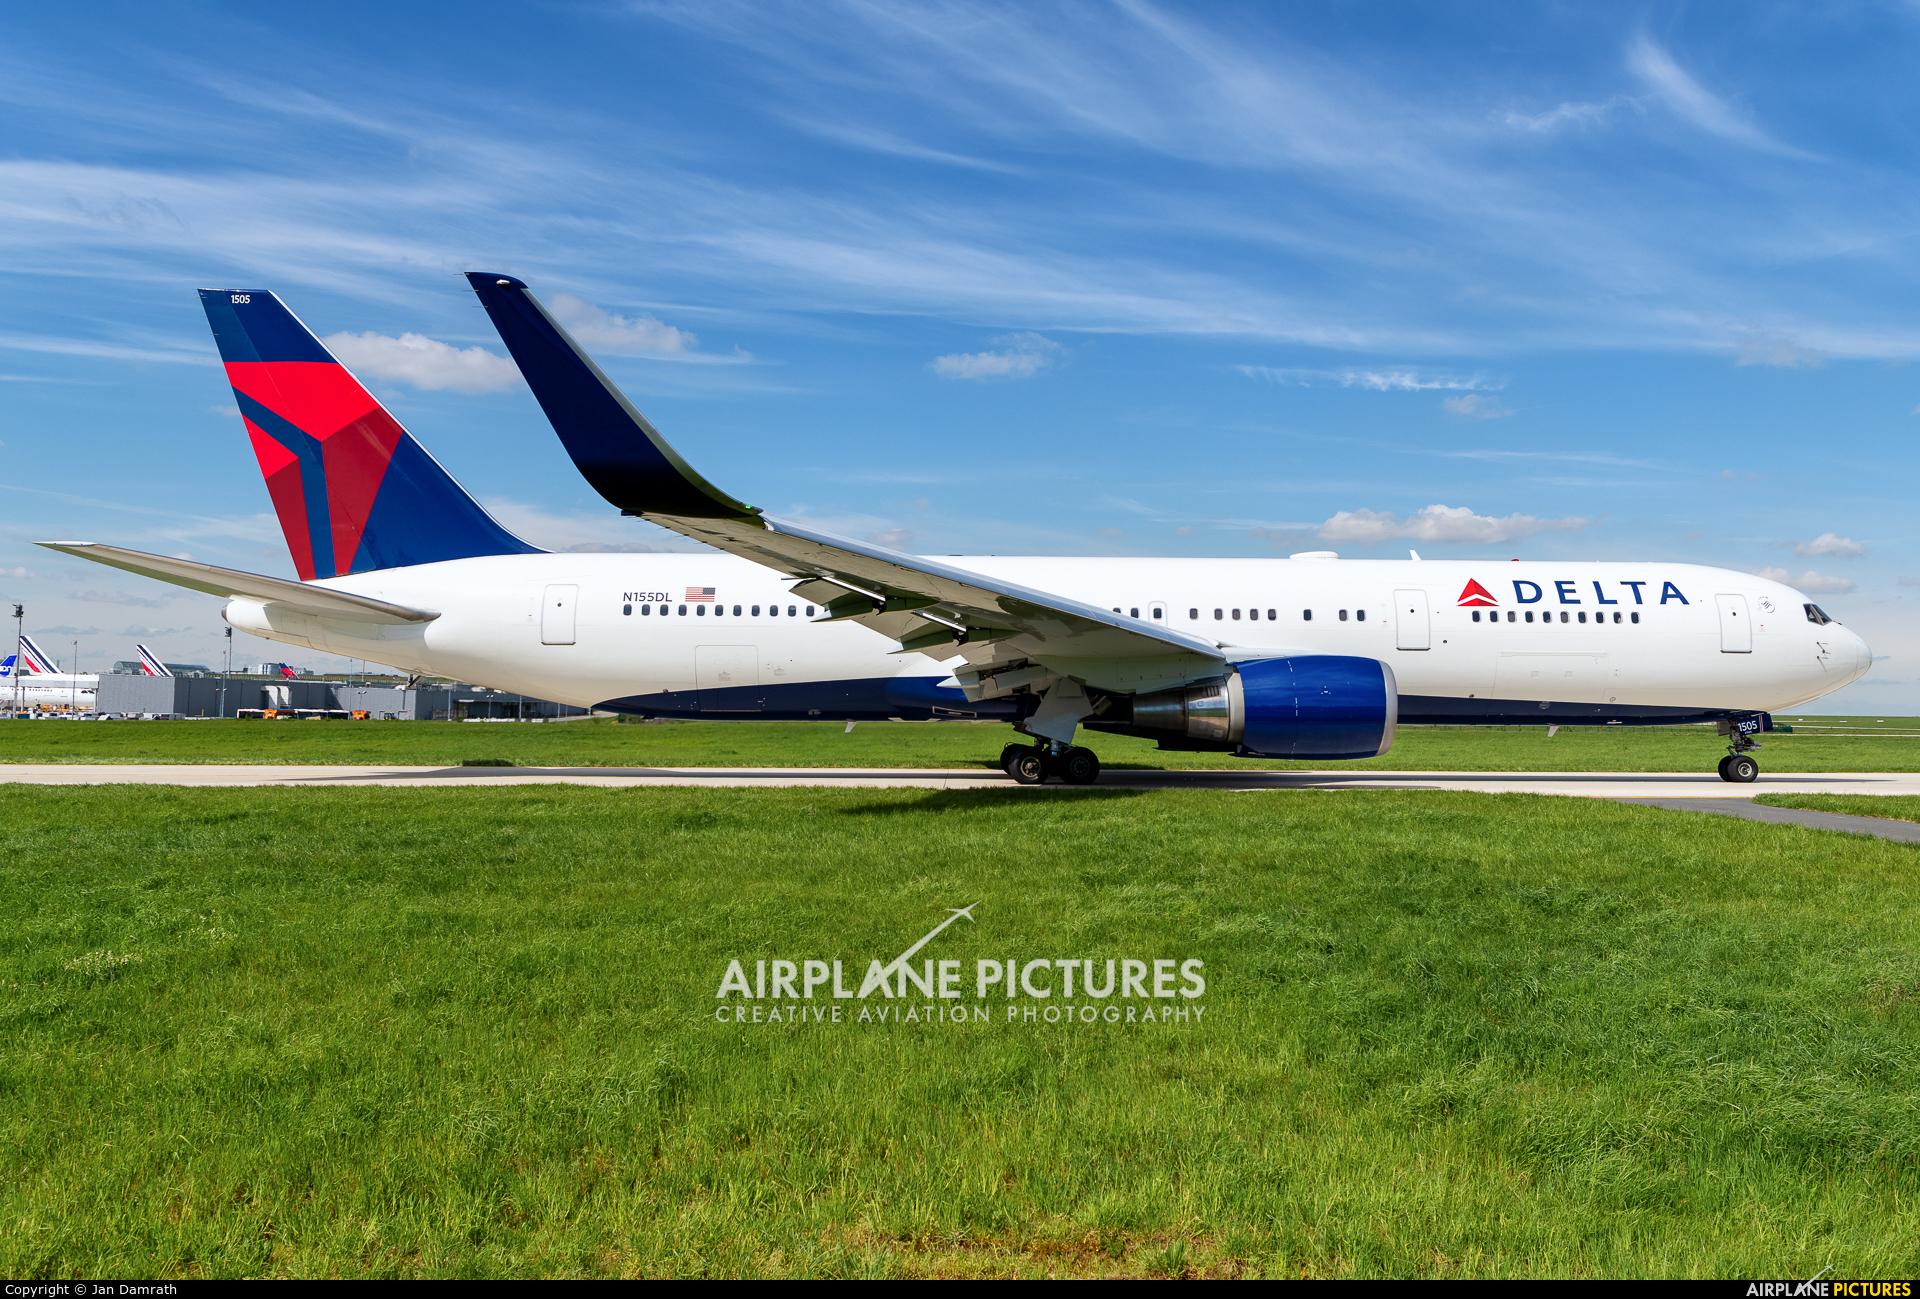 Delta Air Lines N155DL aircraft at Paris - Charles de Gaulle